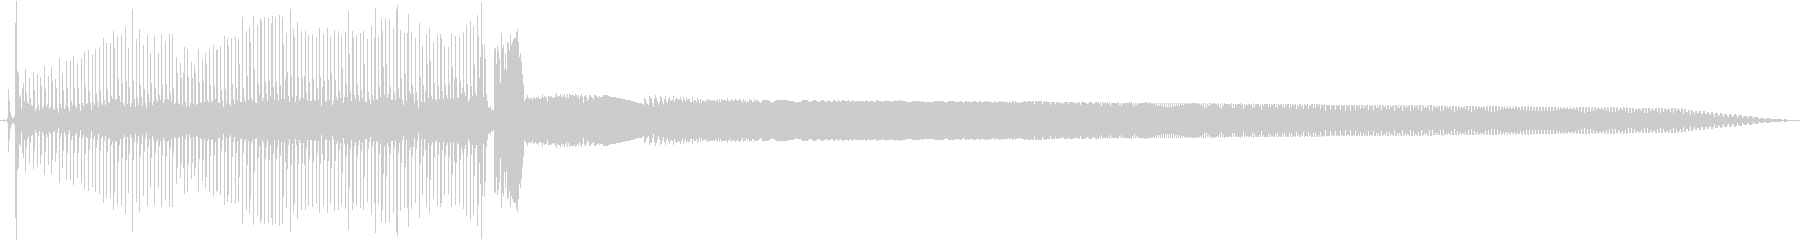 SciFi EC01_92_5の未再生の波形